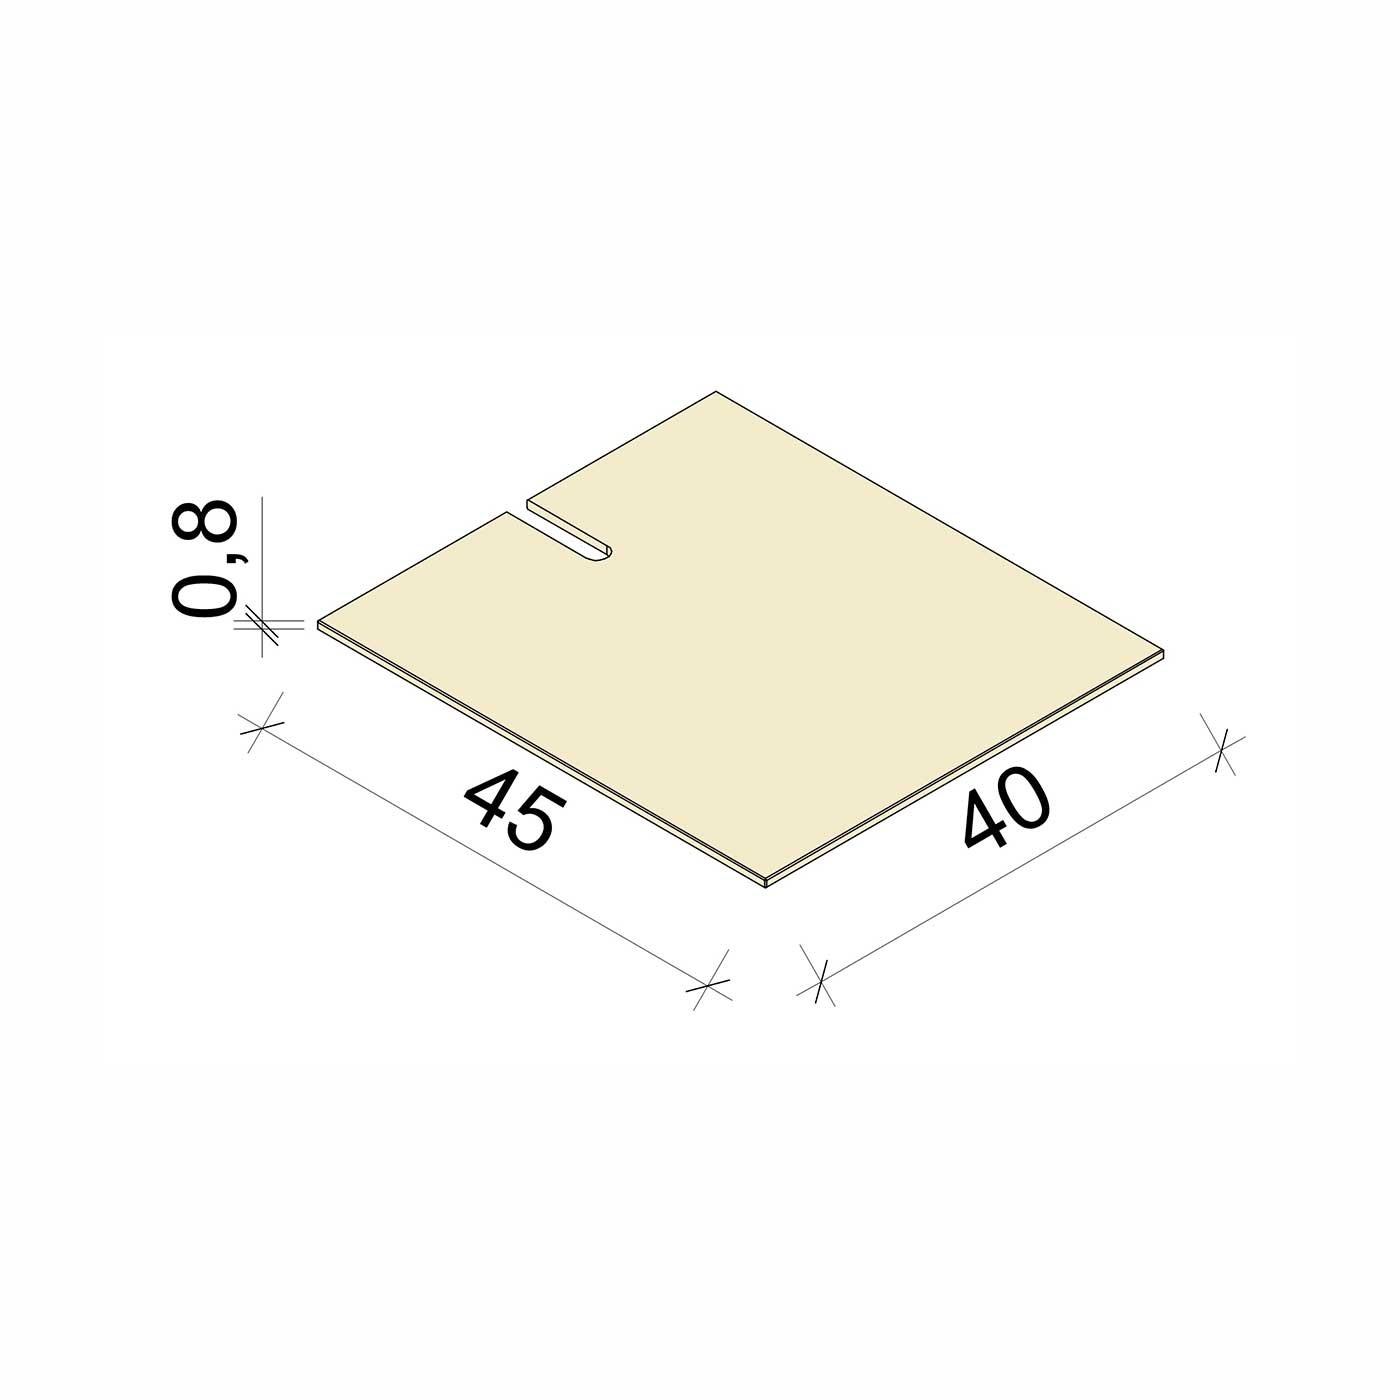 E.T. Stolle - Schlitzglasboden Nebel - Maße: 40 x 45 x 0,8 cm